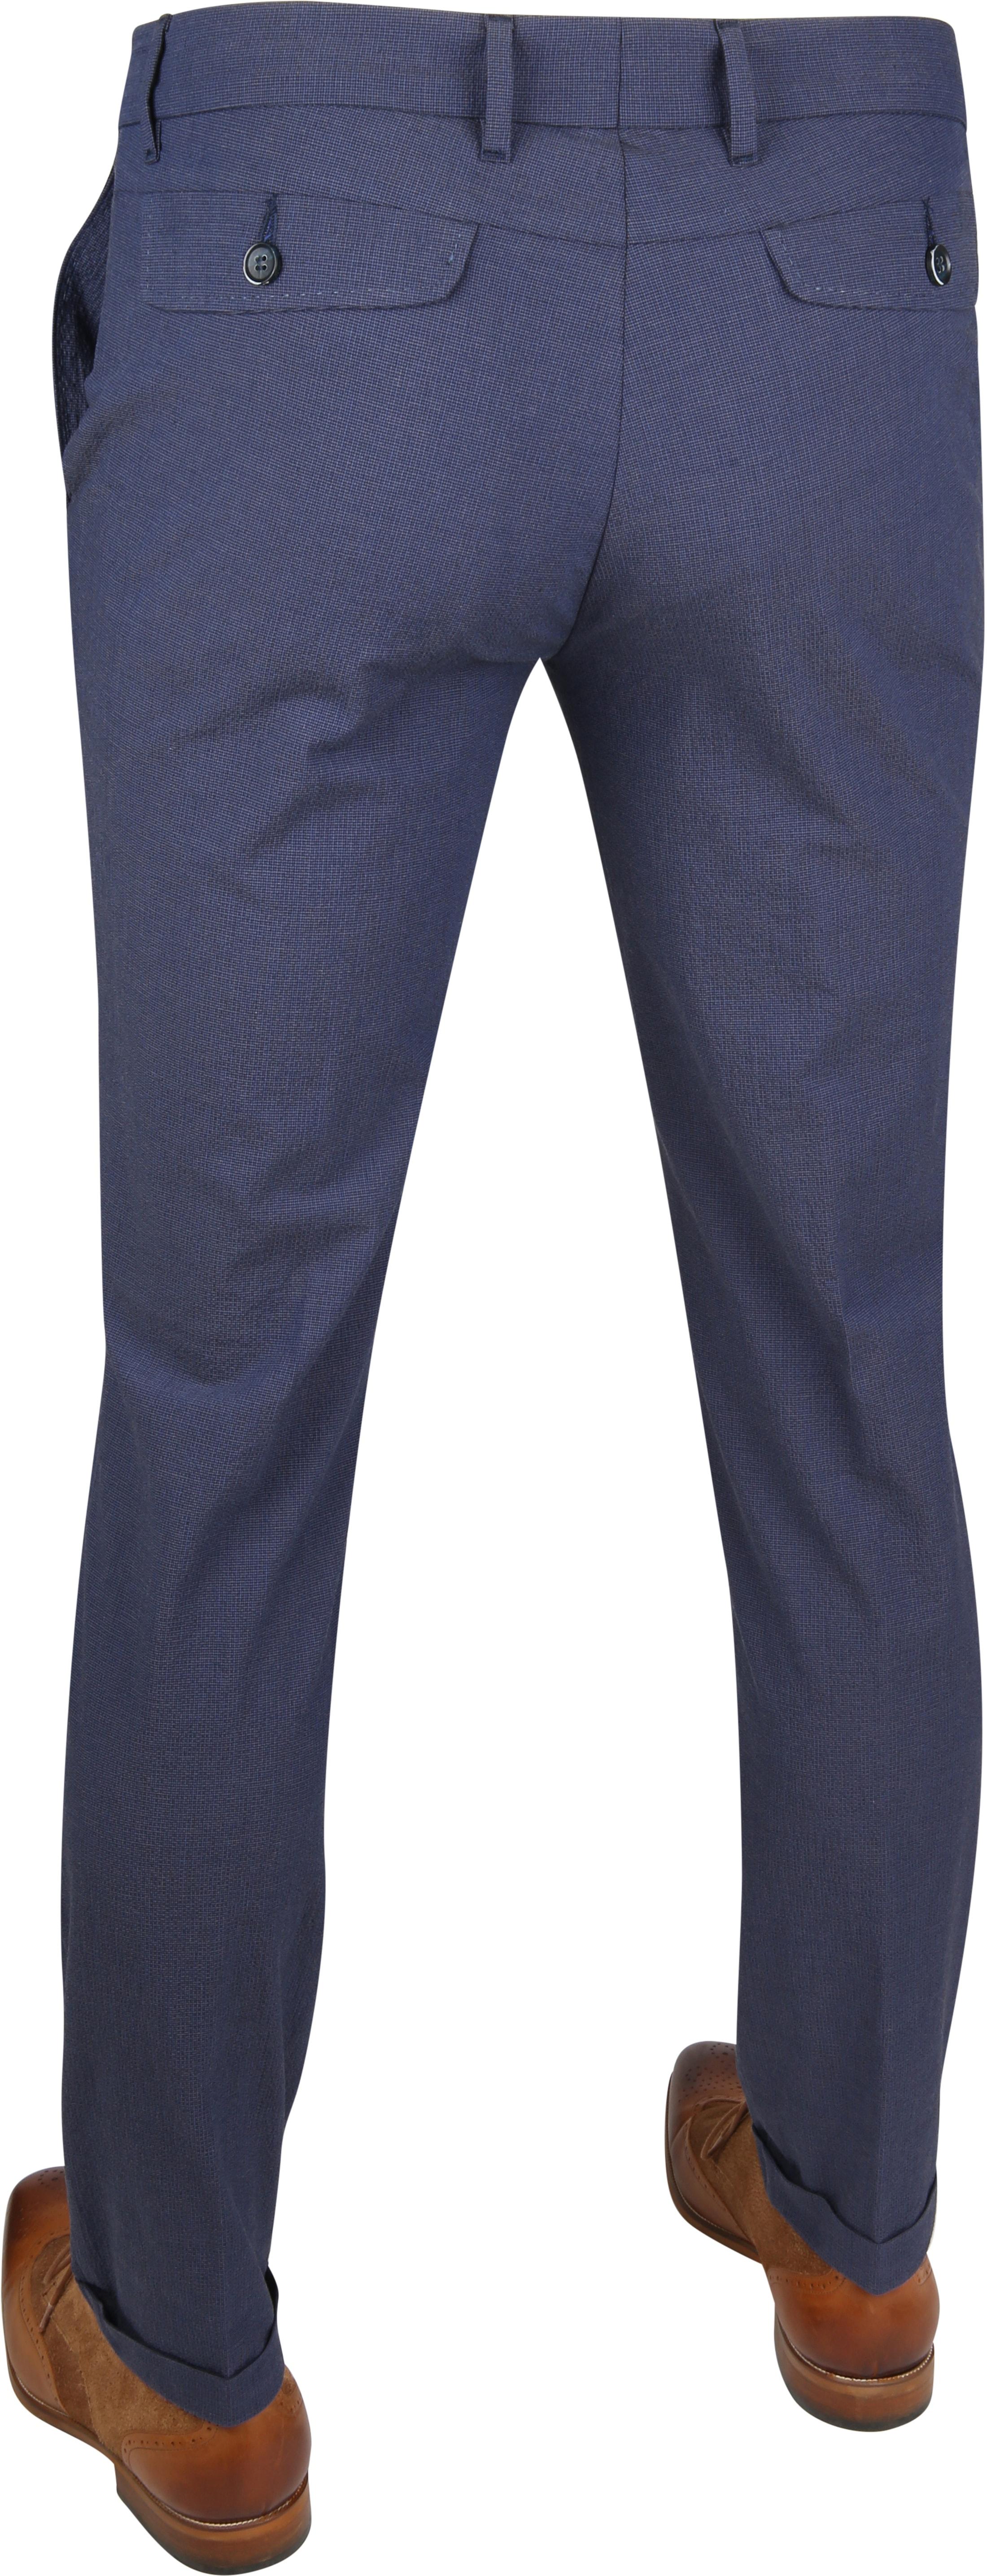 Suitable Pantalon Pisa Dessin Blauw foto 3